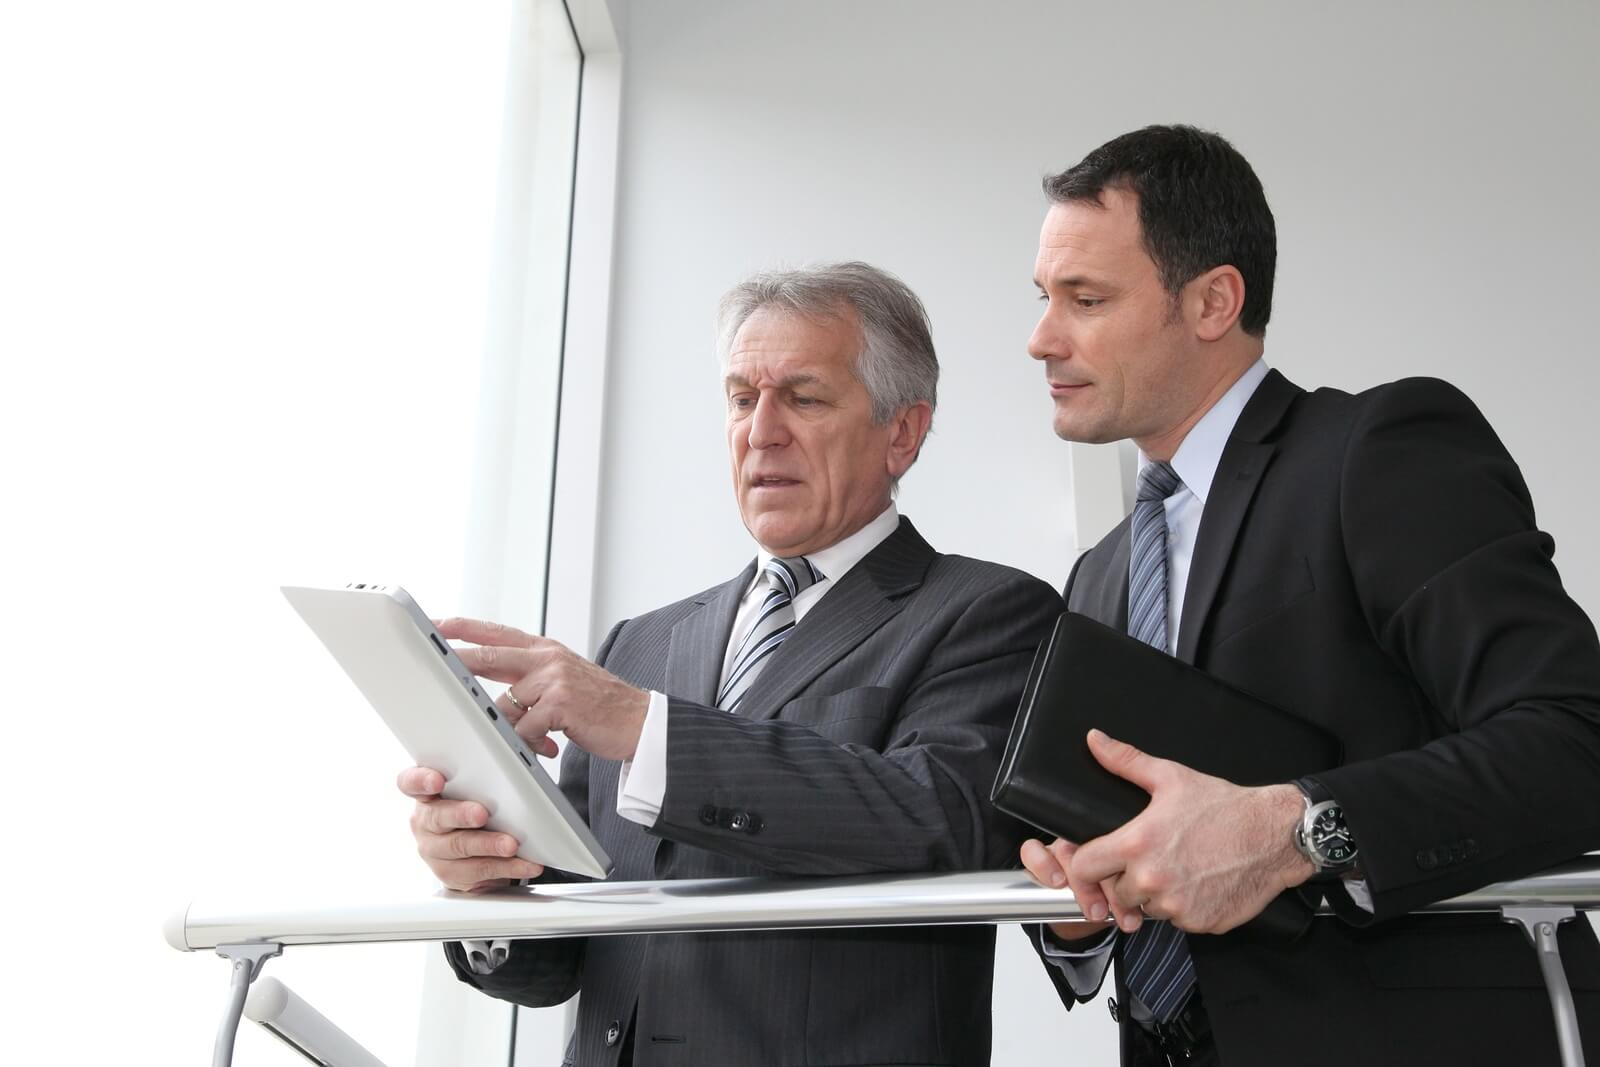 bigstock-Sales-people-working-on-electr-17010287